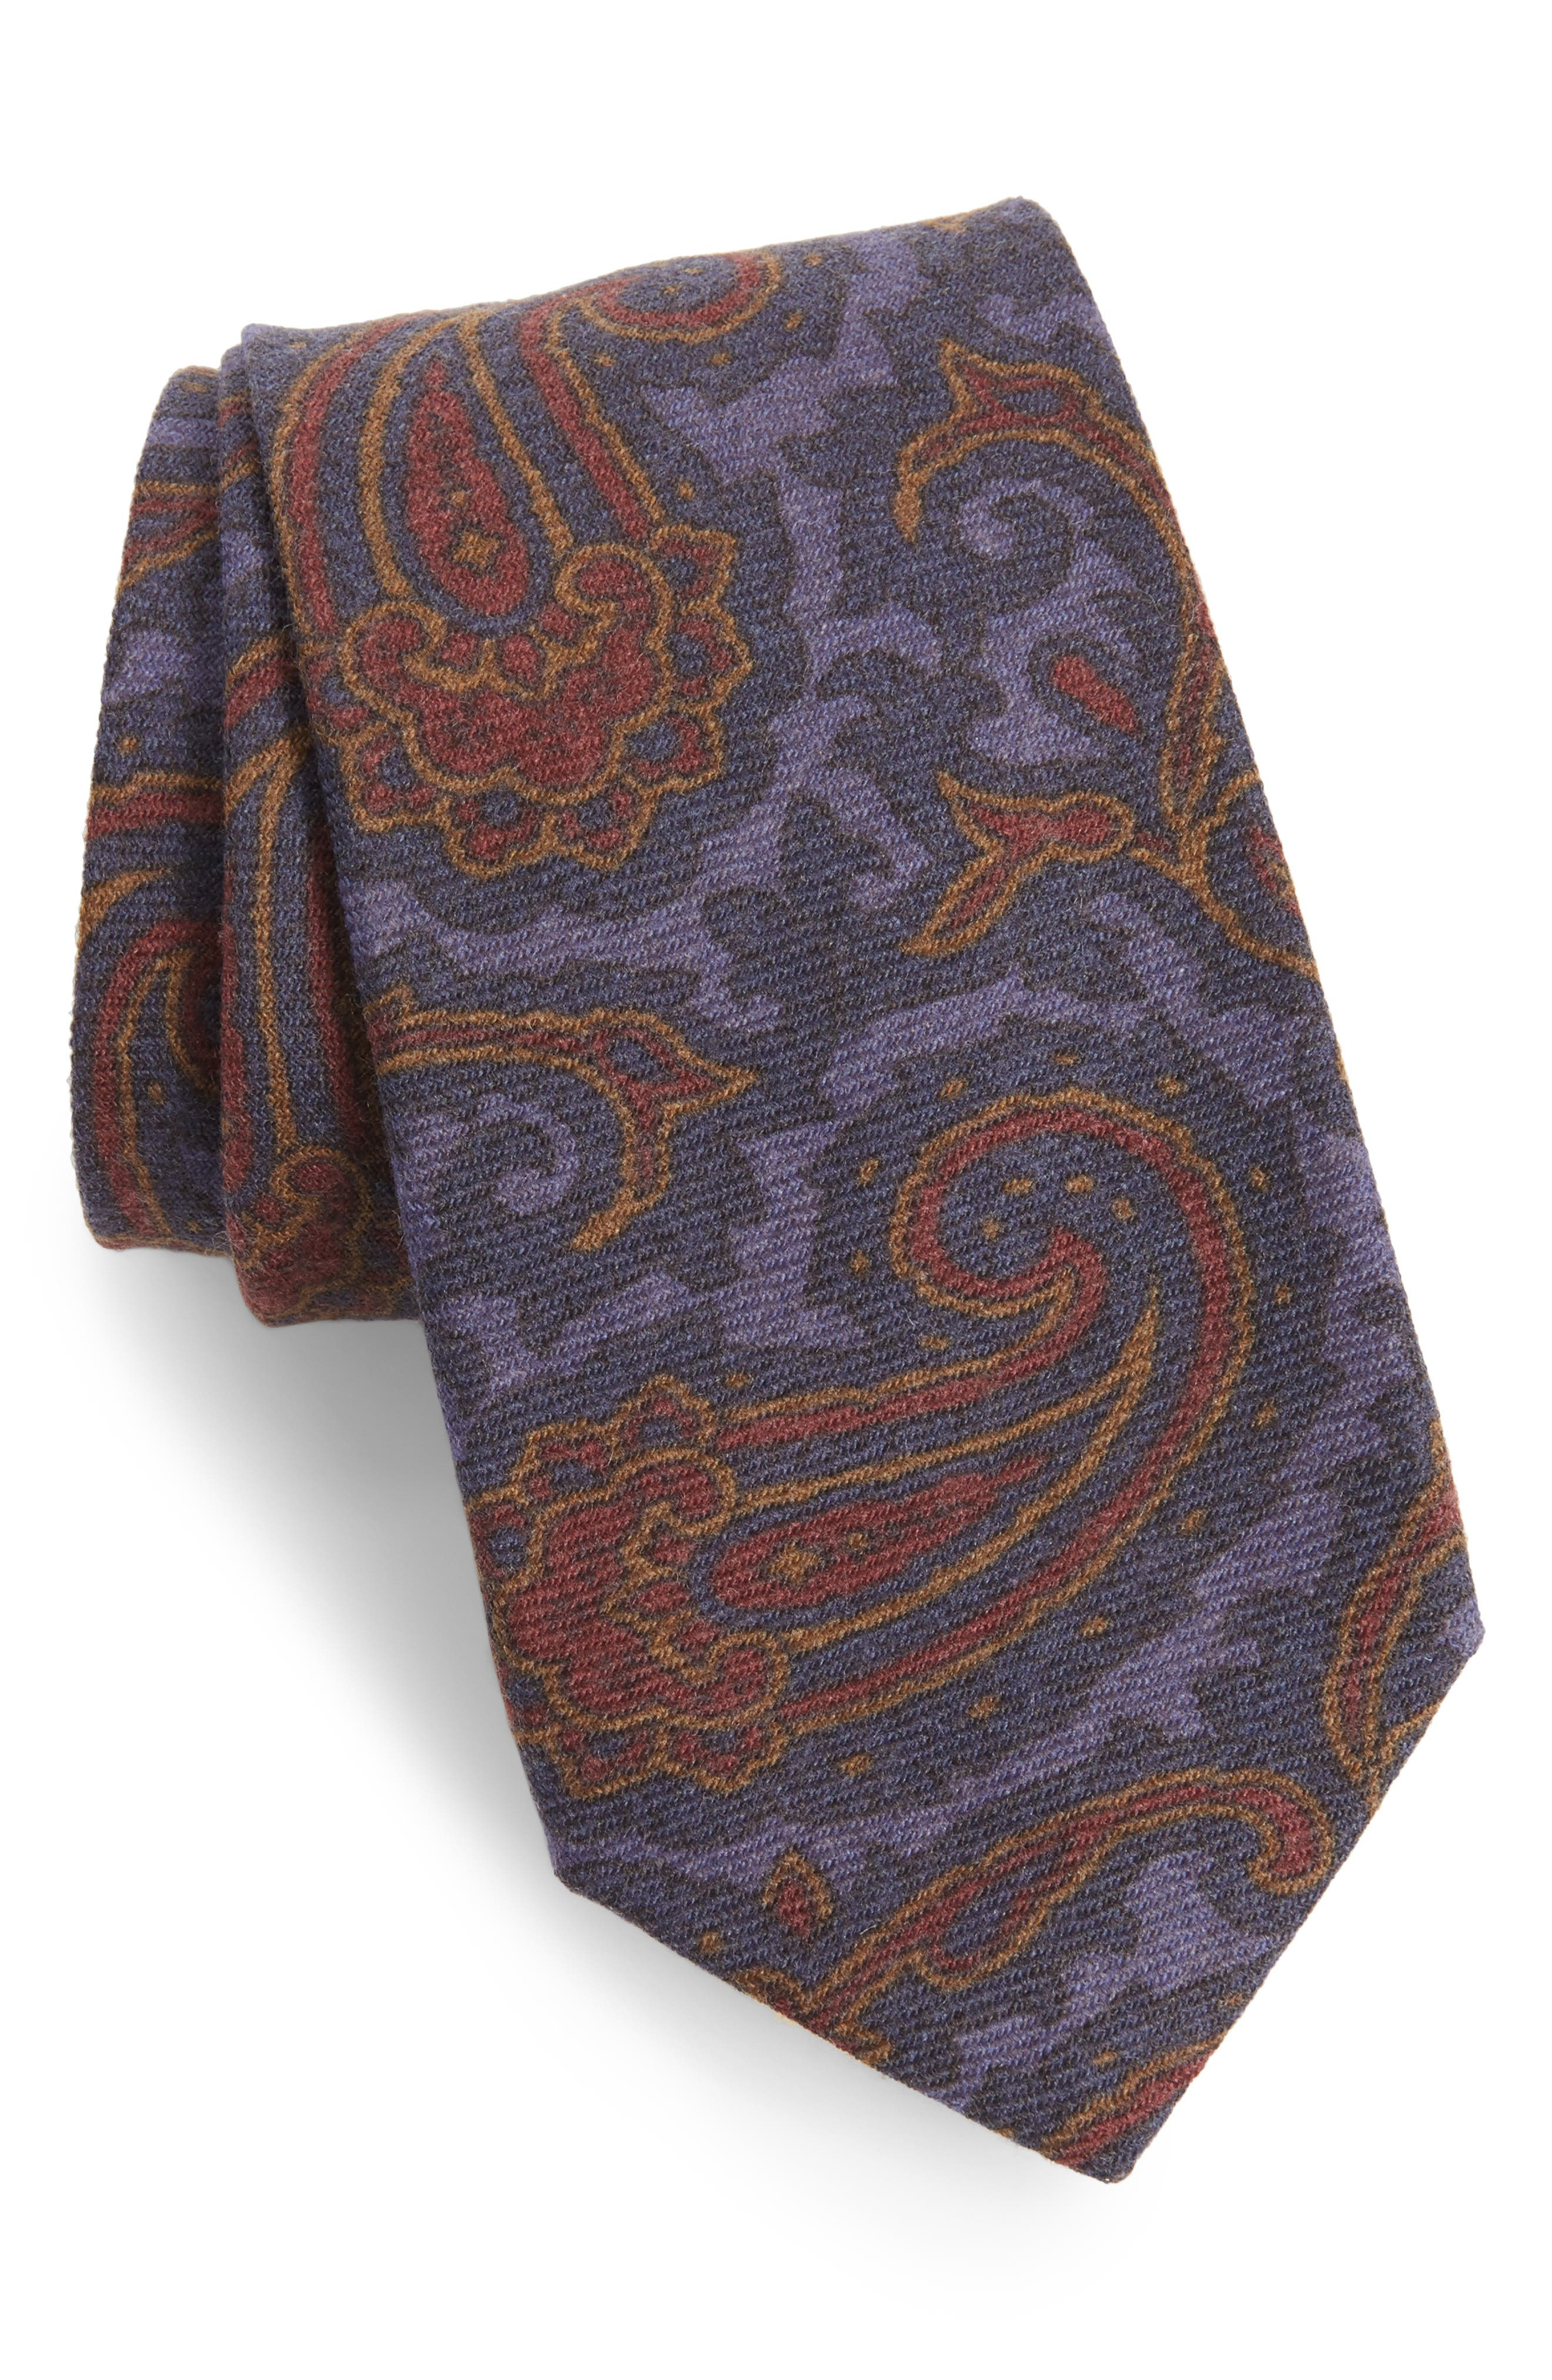 Main Image - Michael Bastian Paisley Wool Tie